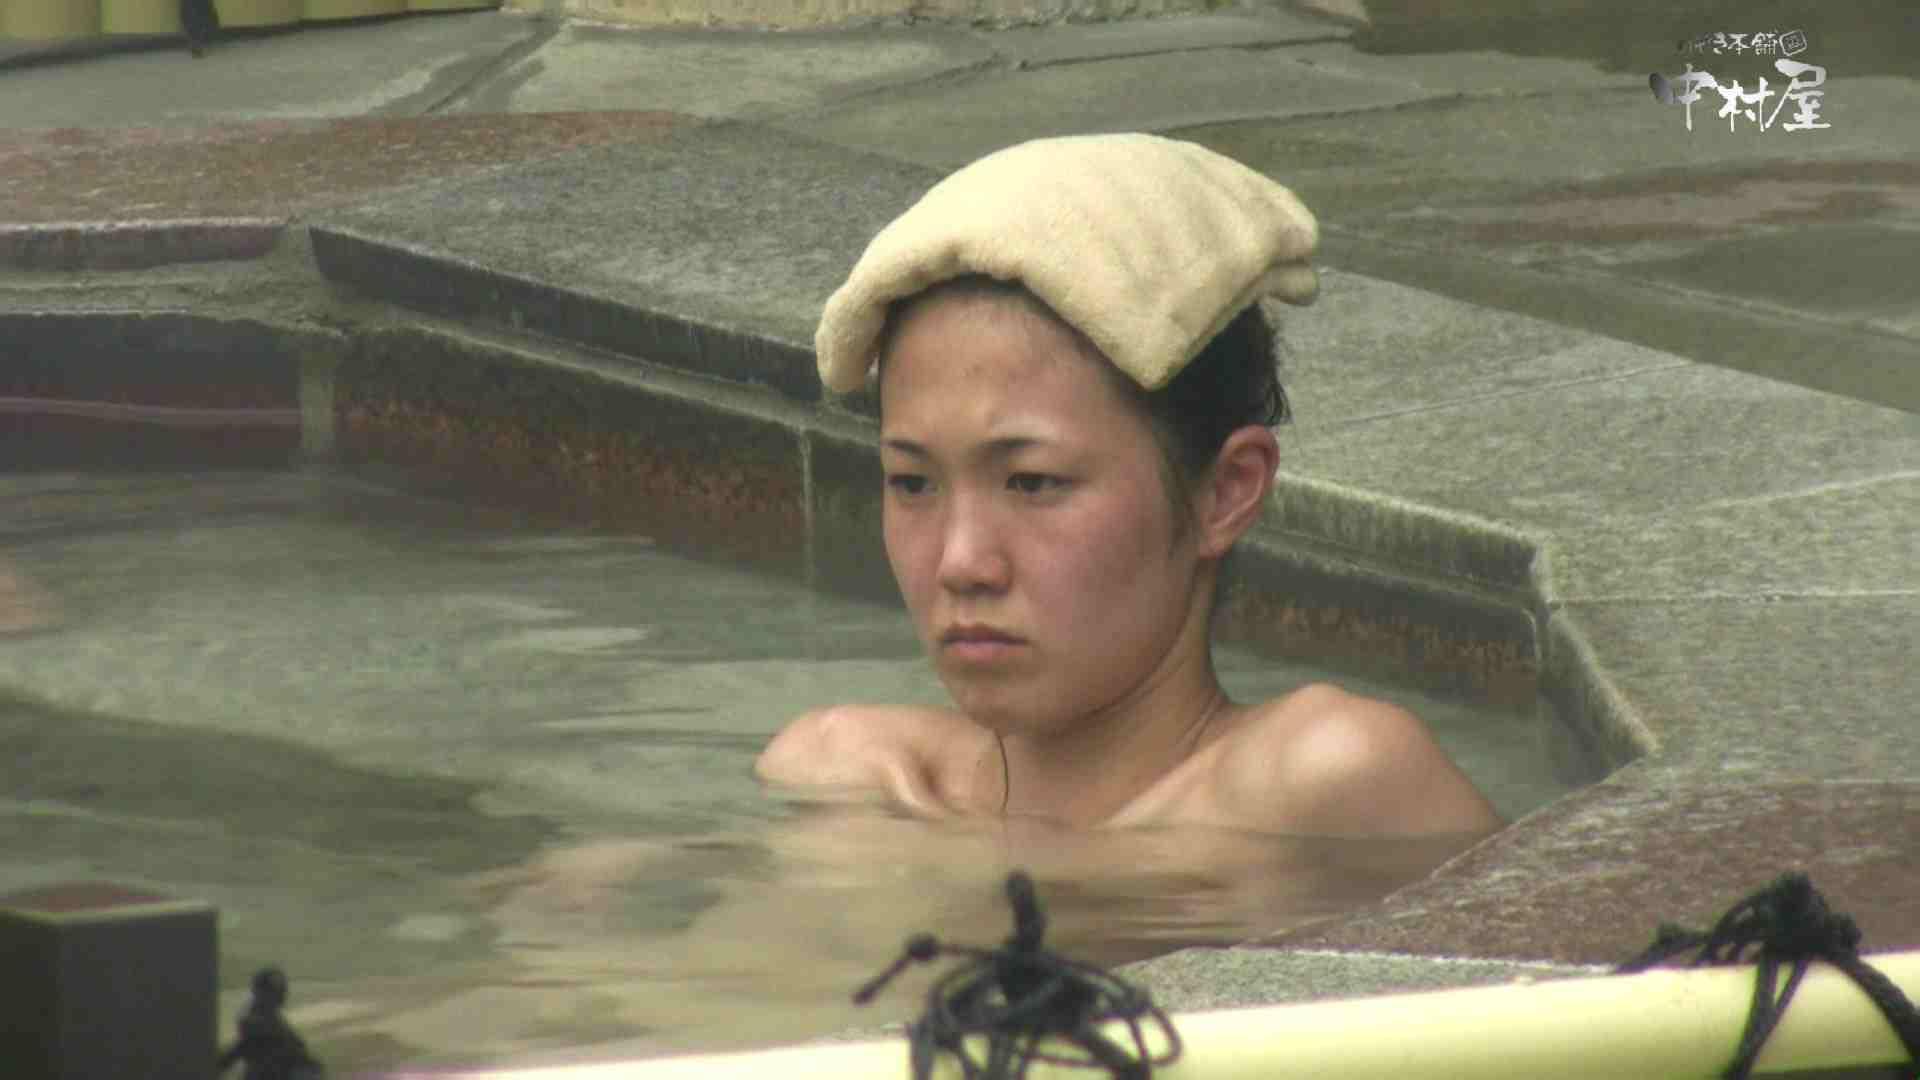 Aquaな露天風呂Vol.889 0  87連発 74